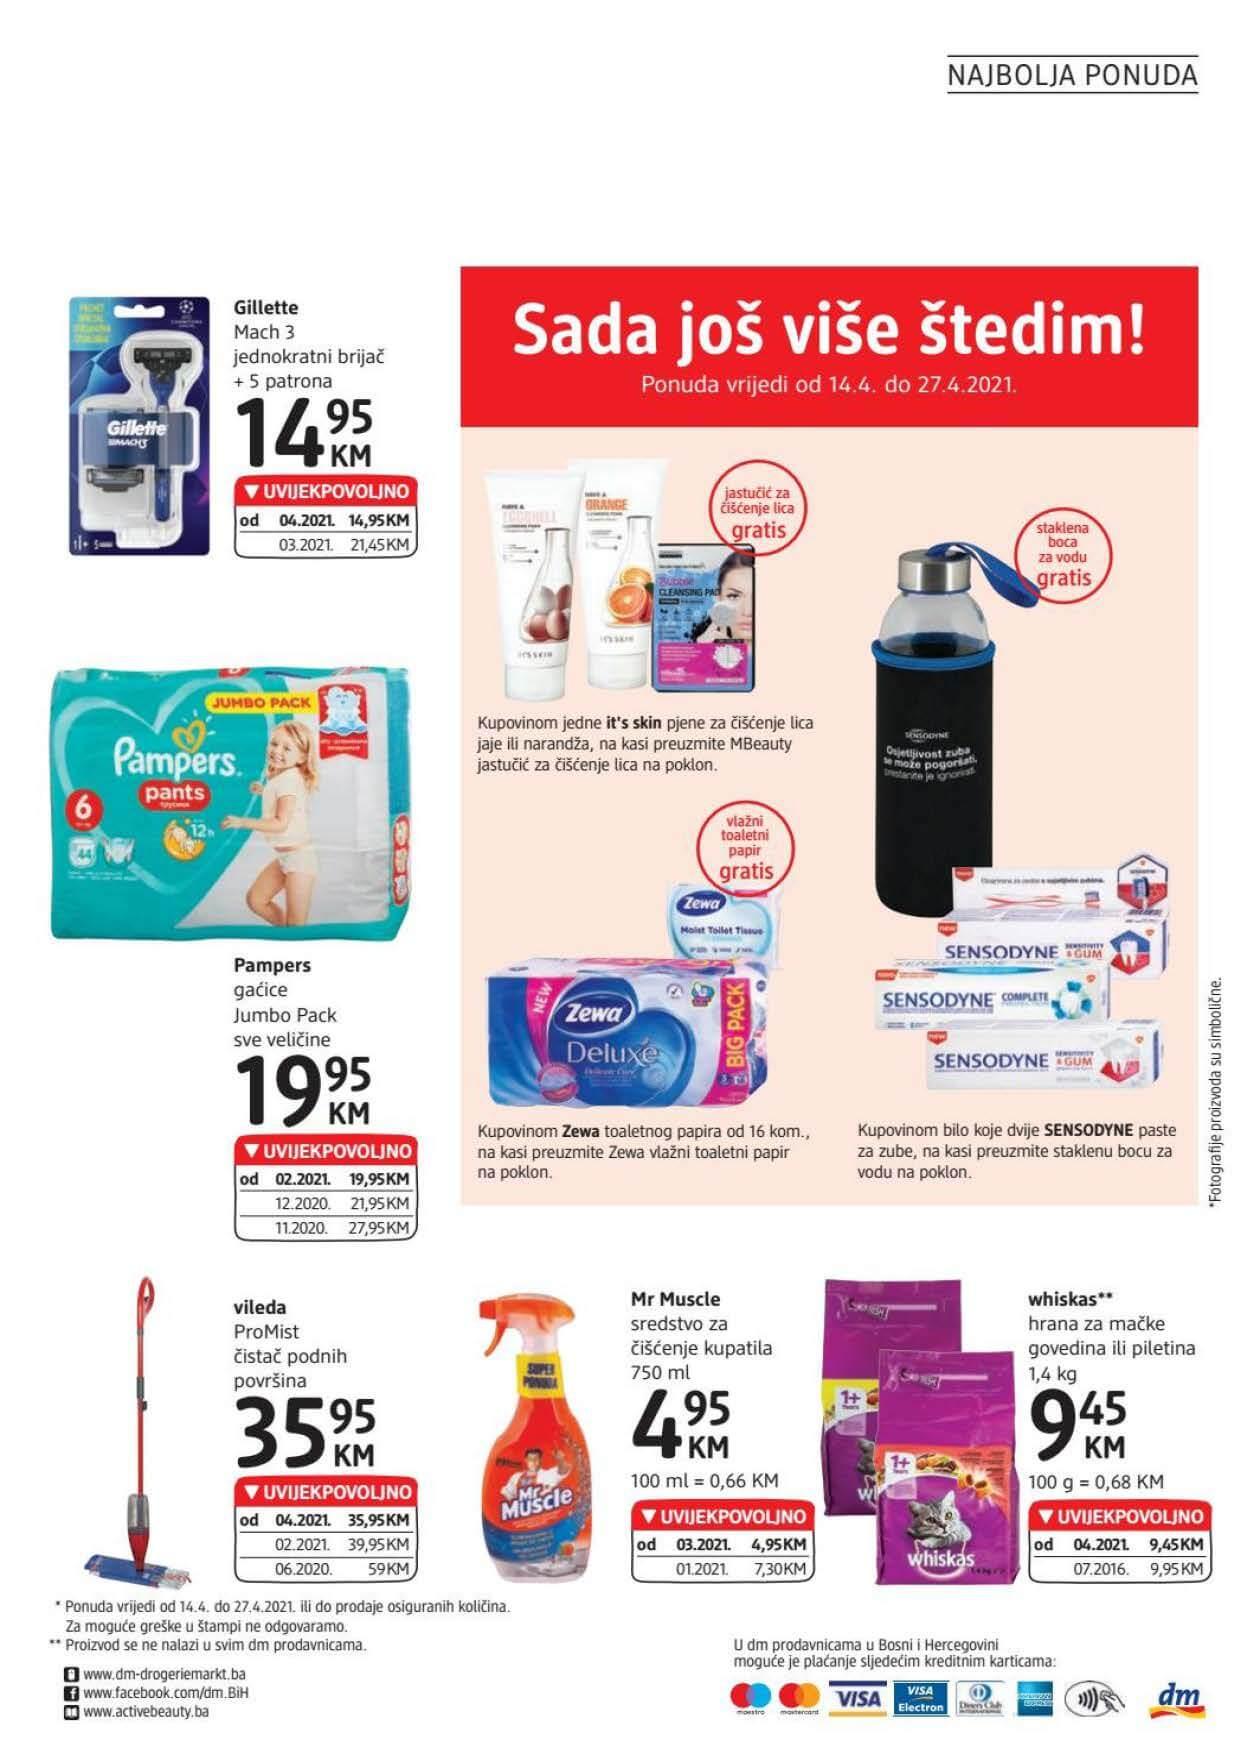 DM Katalog BiH April 2021 14.04.2021. 27.04.2021. Page 24